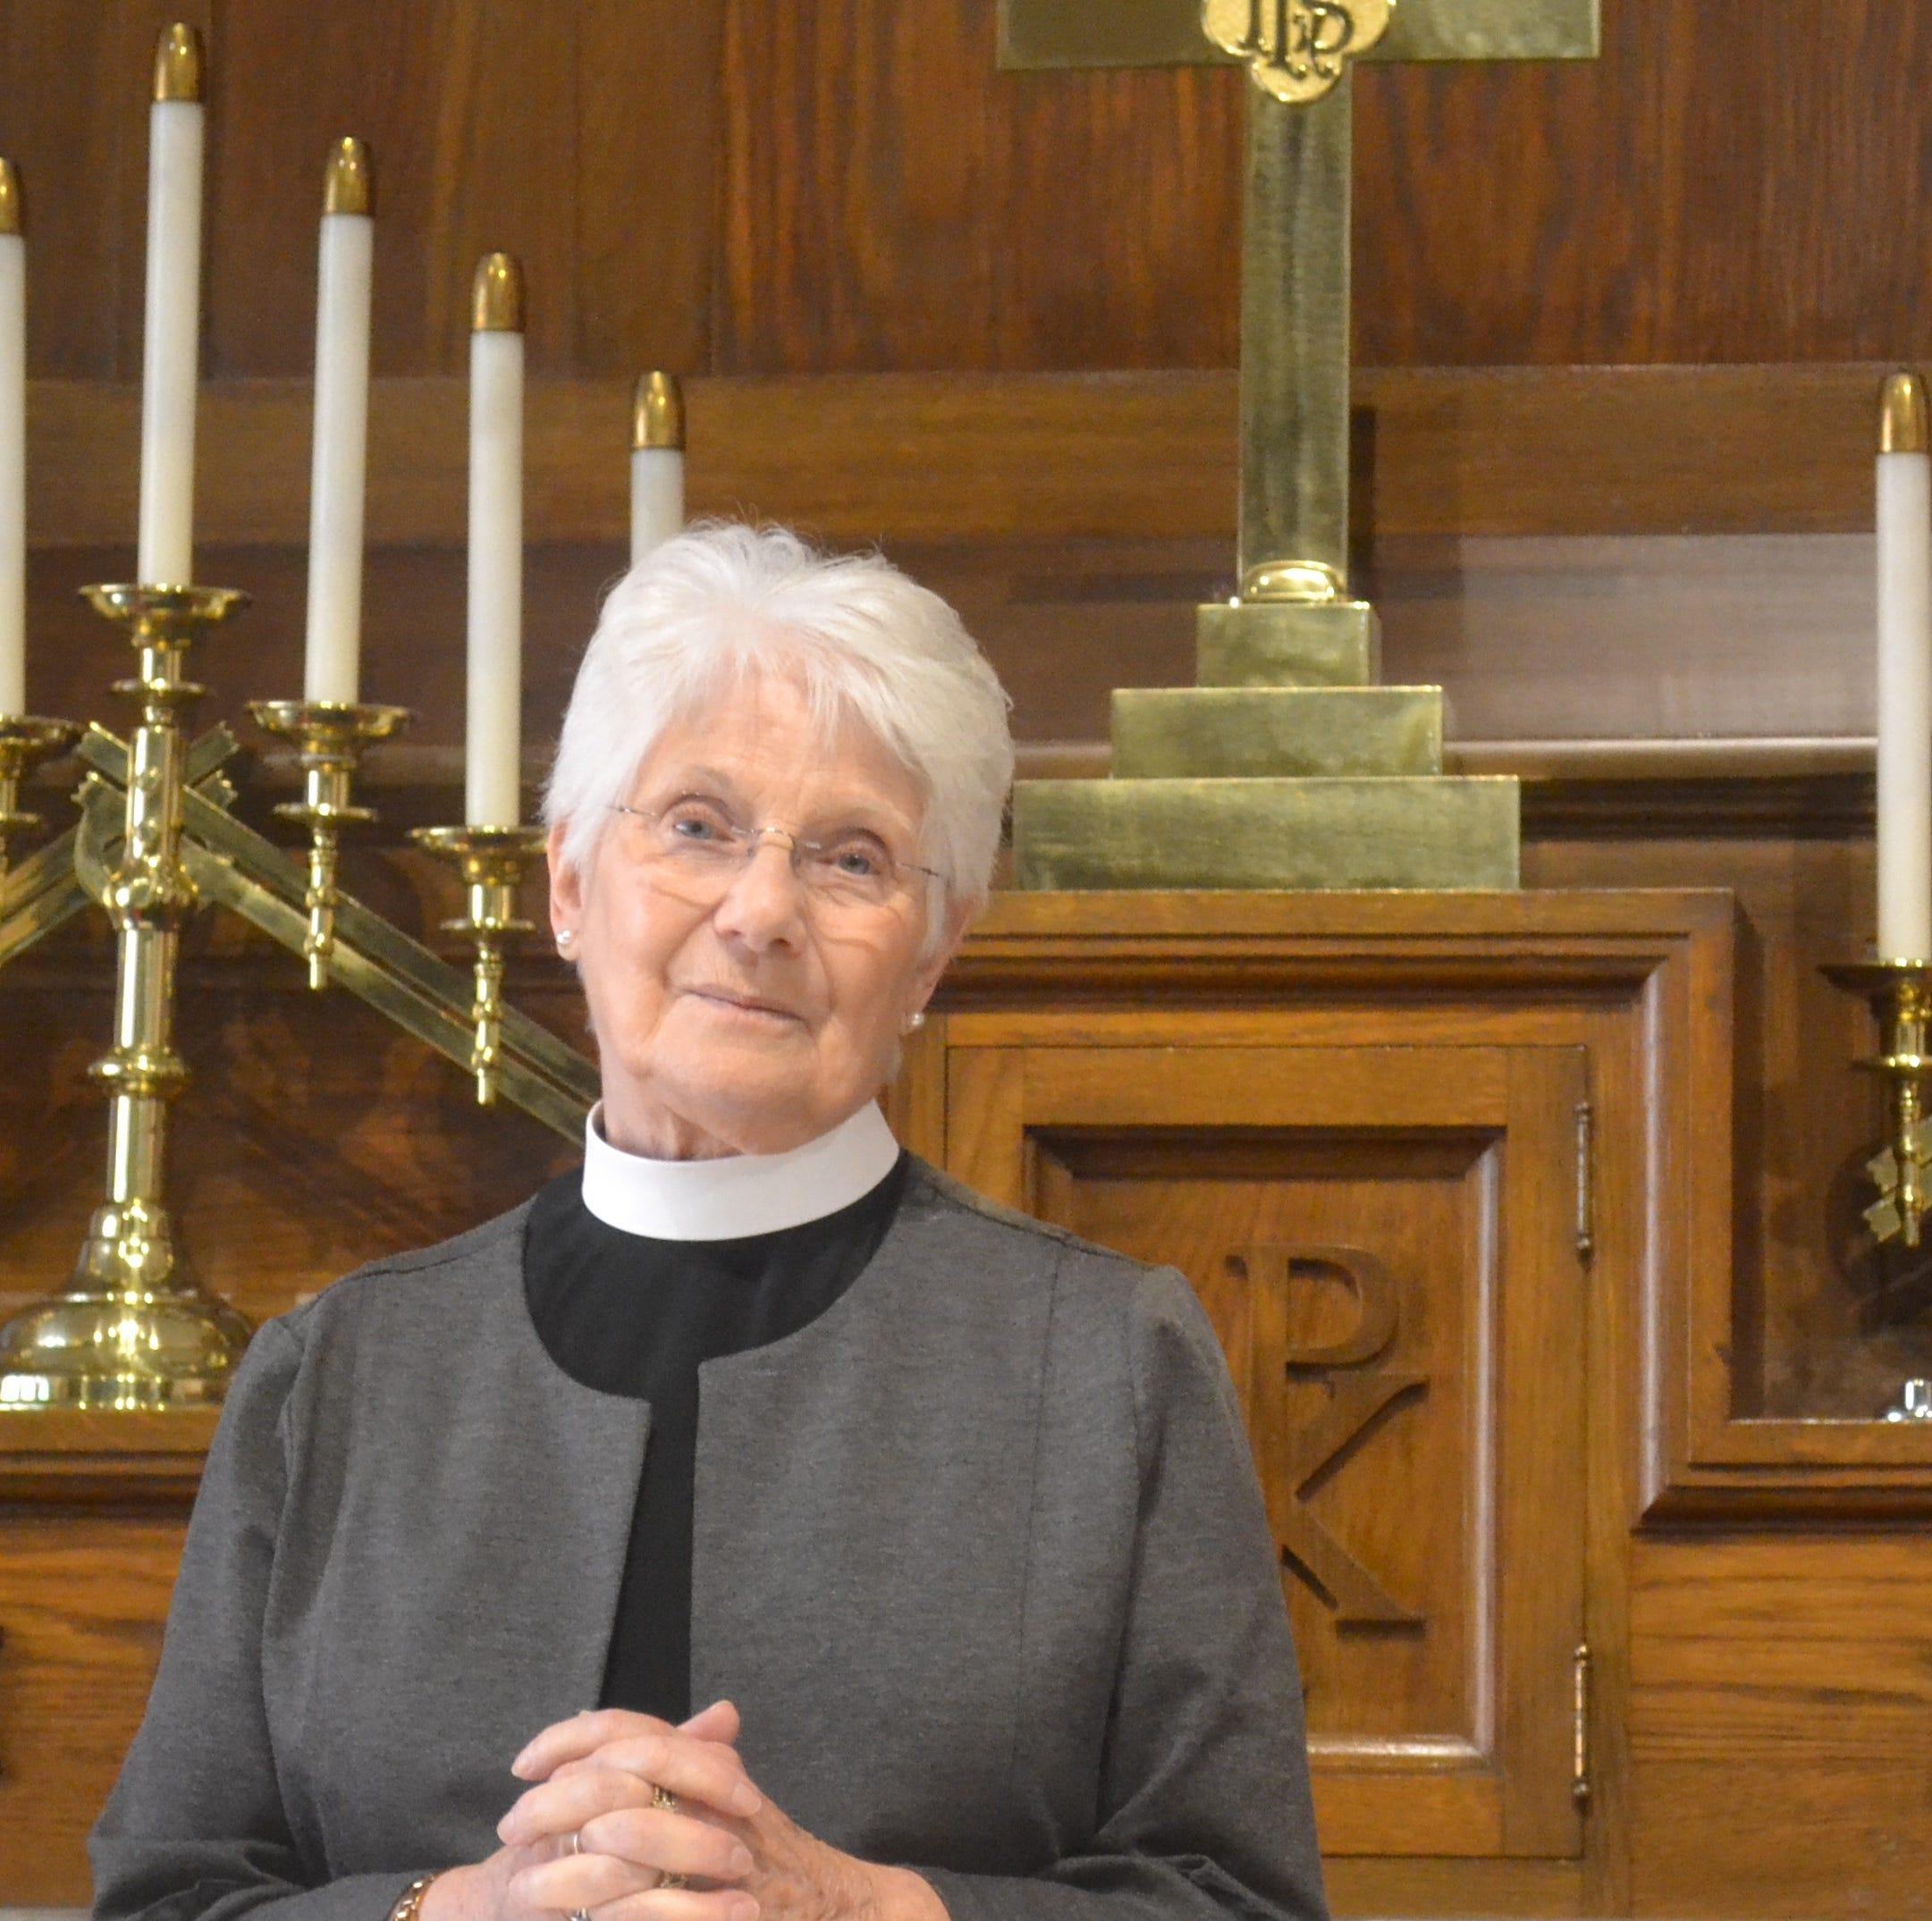 St. Thomas' new pastor traveled a long path to Port Clinton parish